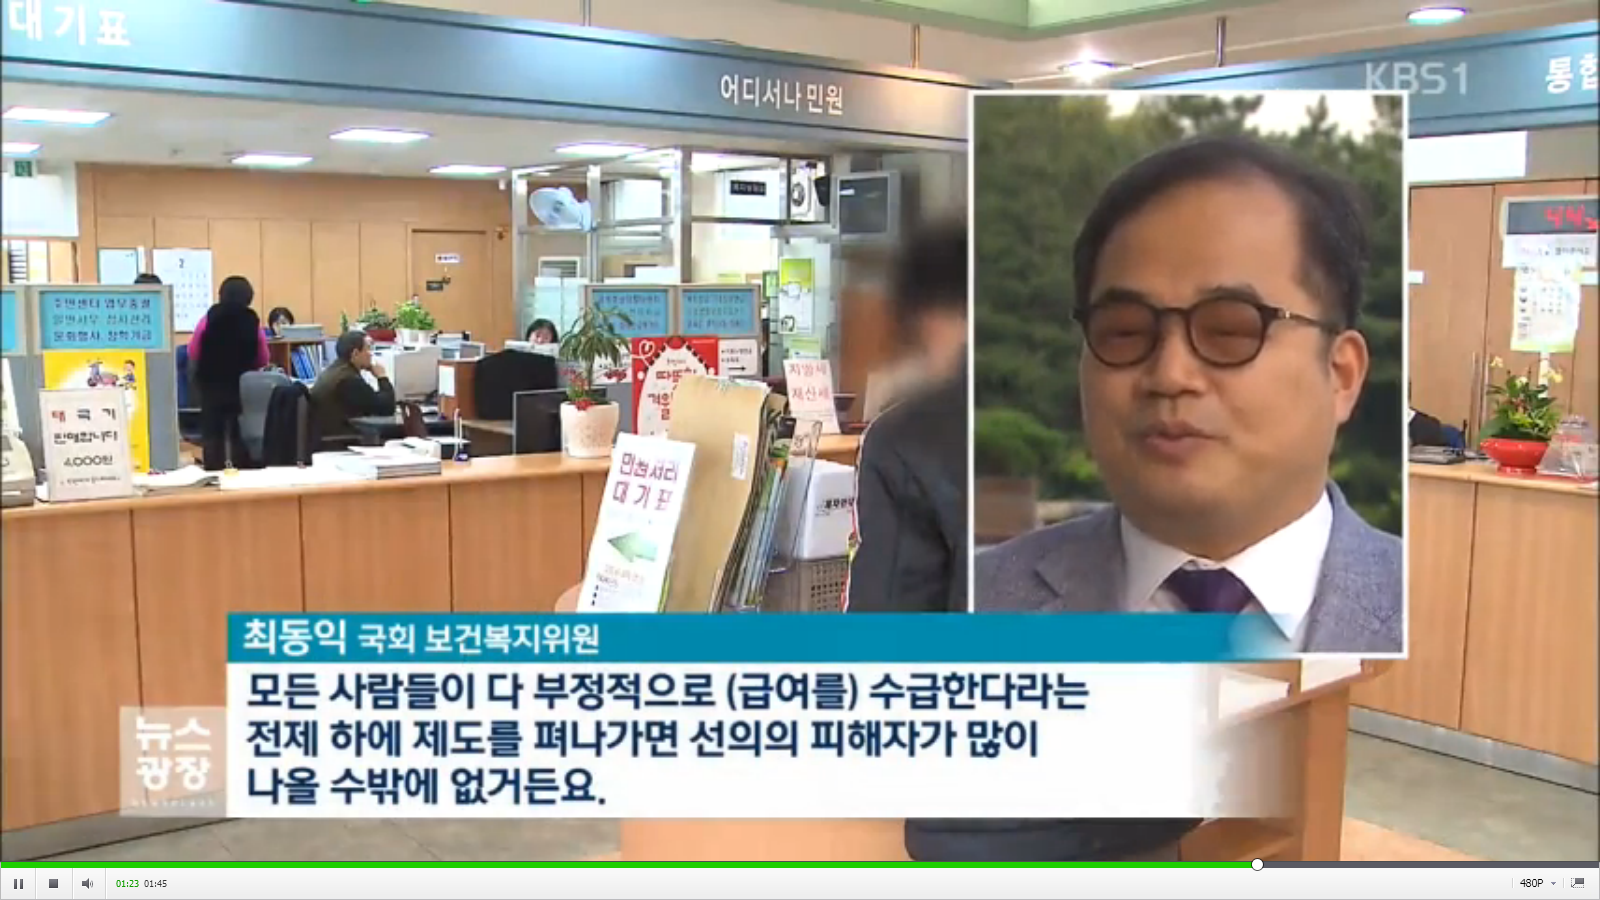 [15.9.24 KBS] 휴학하면 소득 생기나 기초 수급자 울리는 추정소득4.png